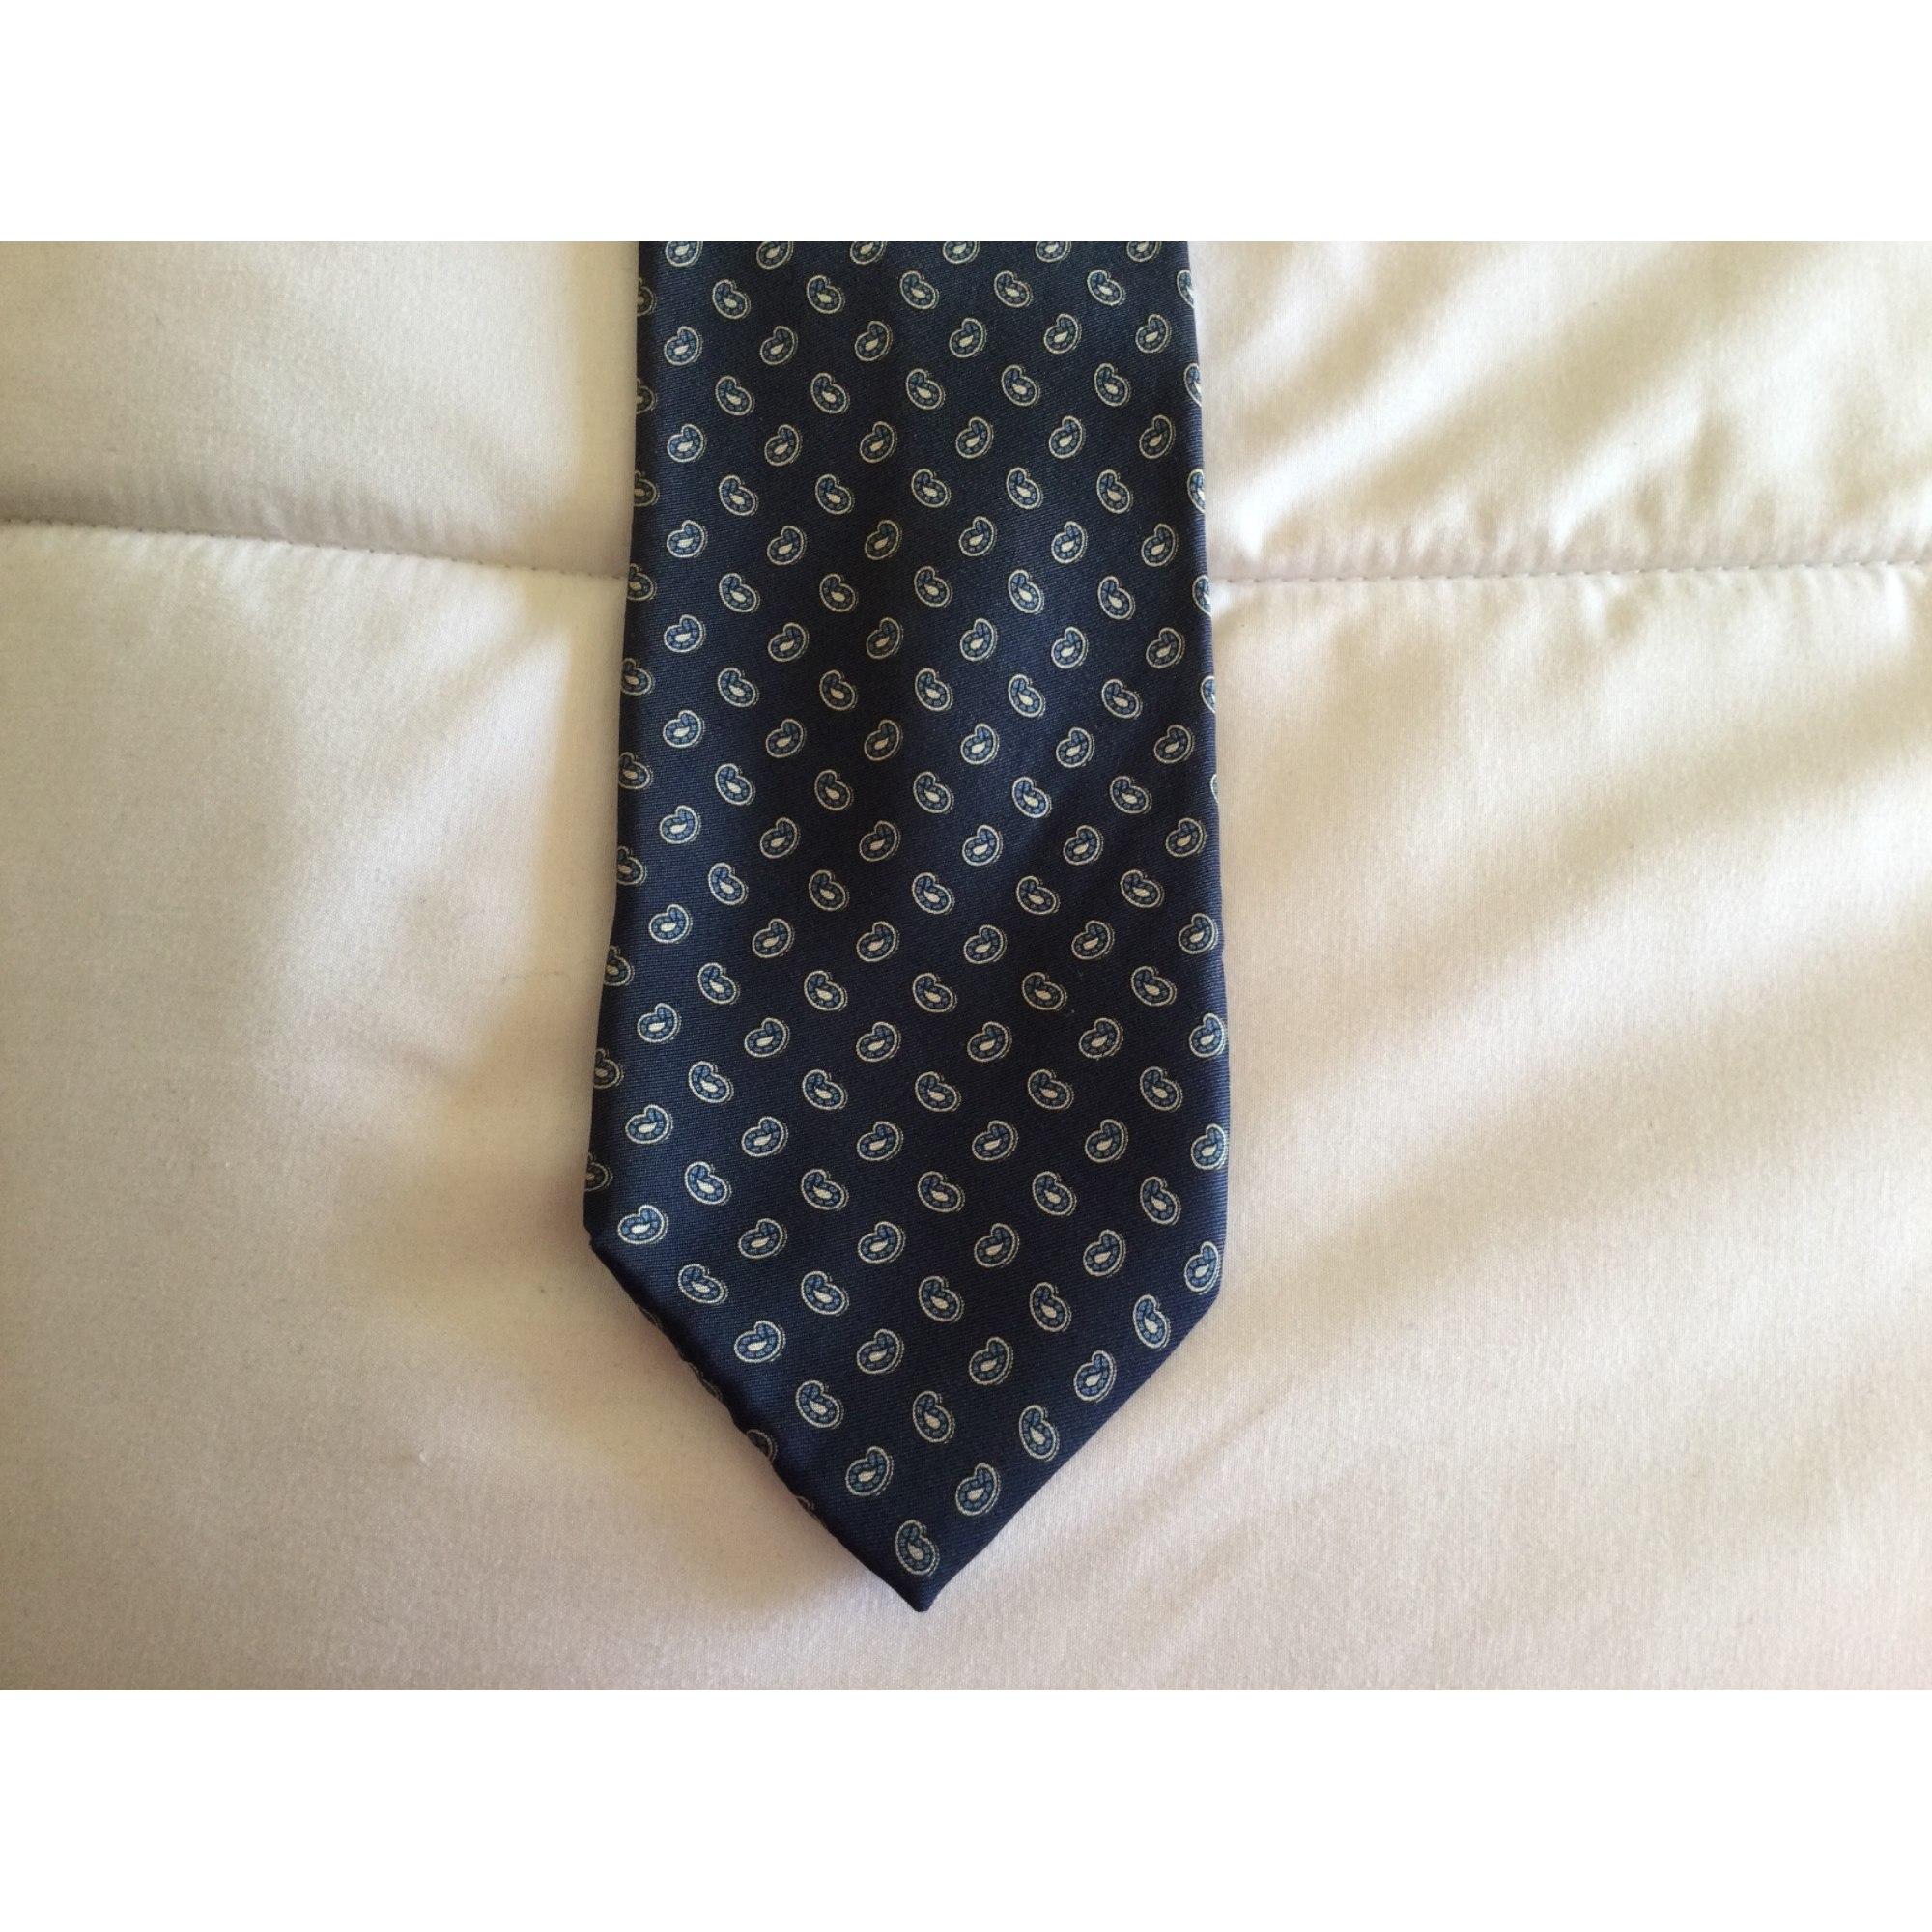 Cravate TIE RACK Bleu, bleu marine, bleu turquoise